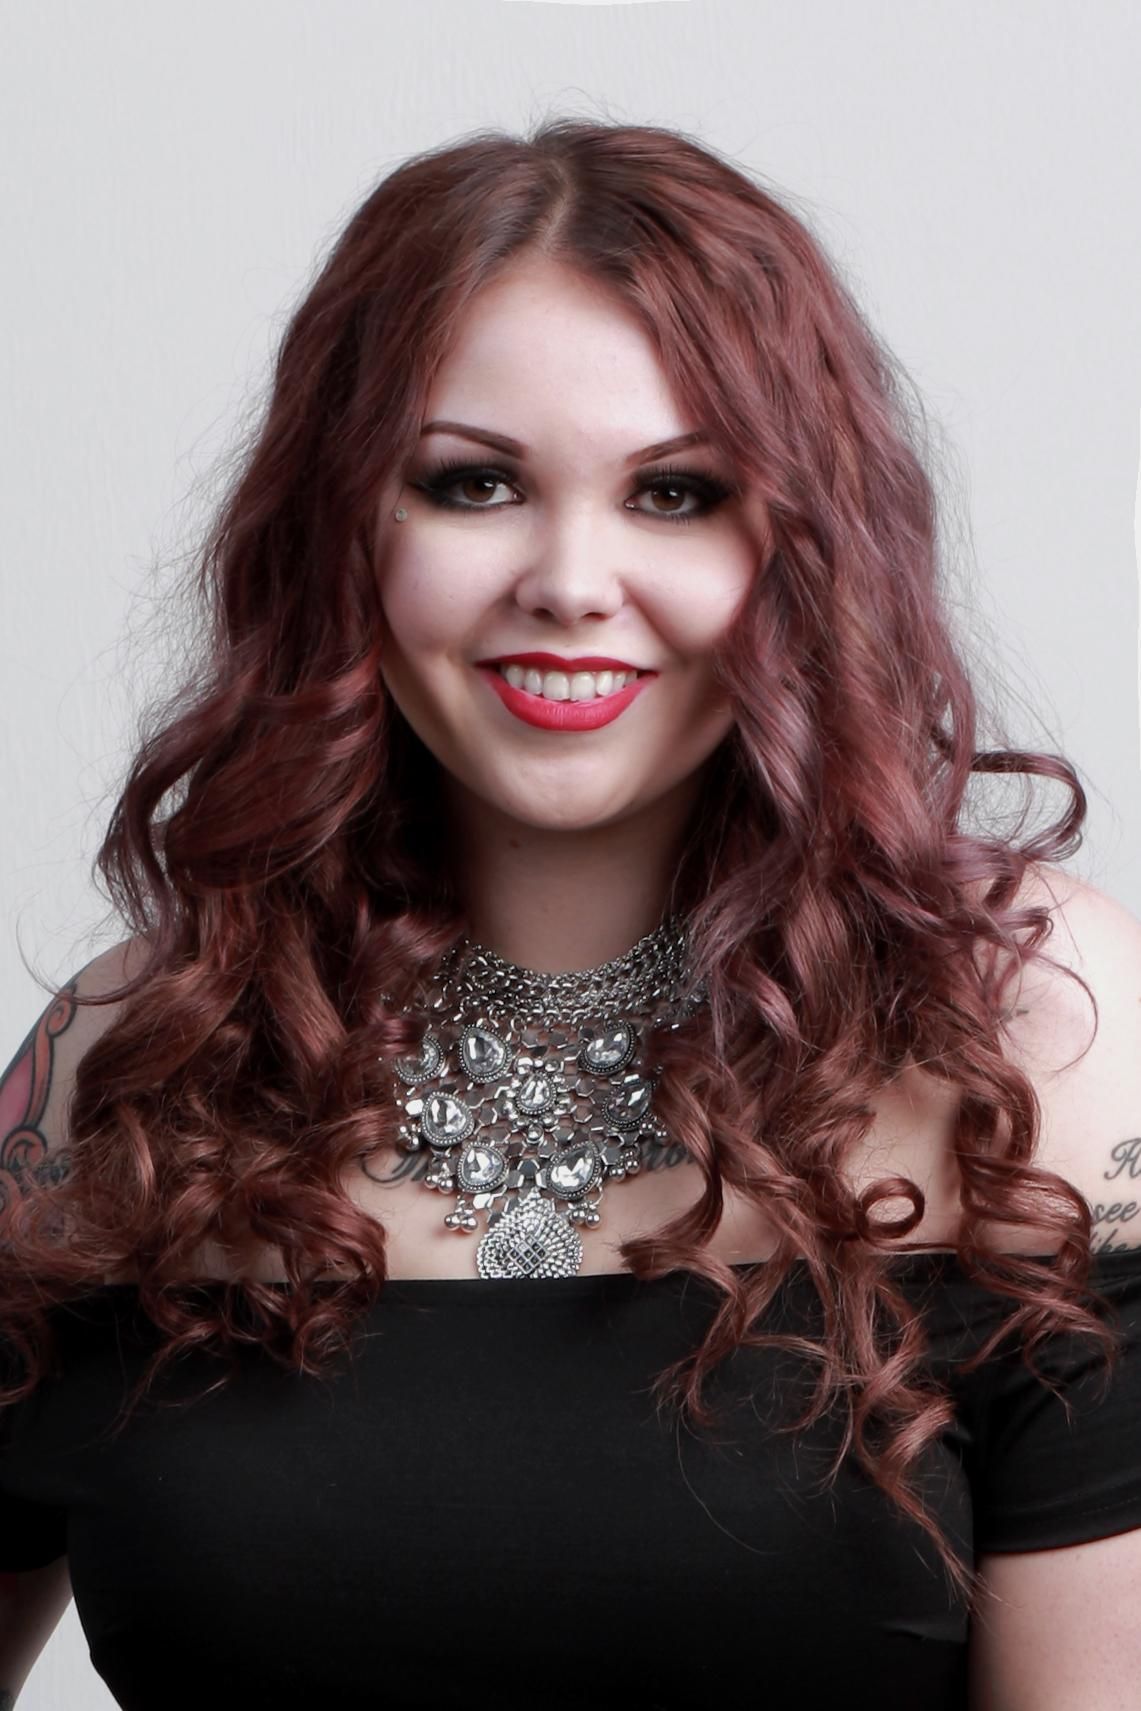 6. Laura Hyrkkö, 22, Lohja